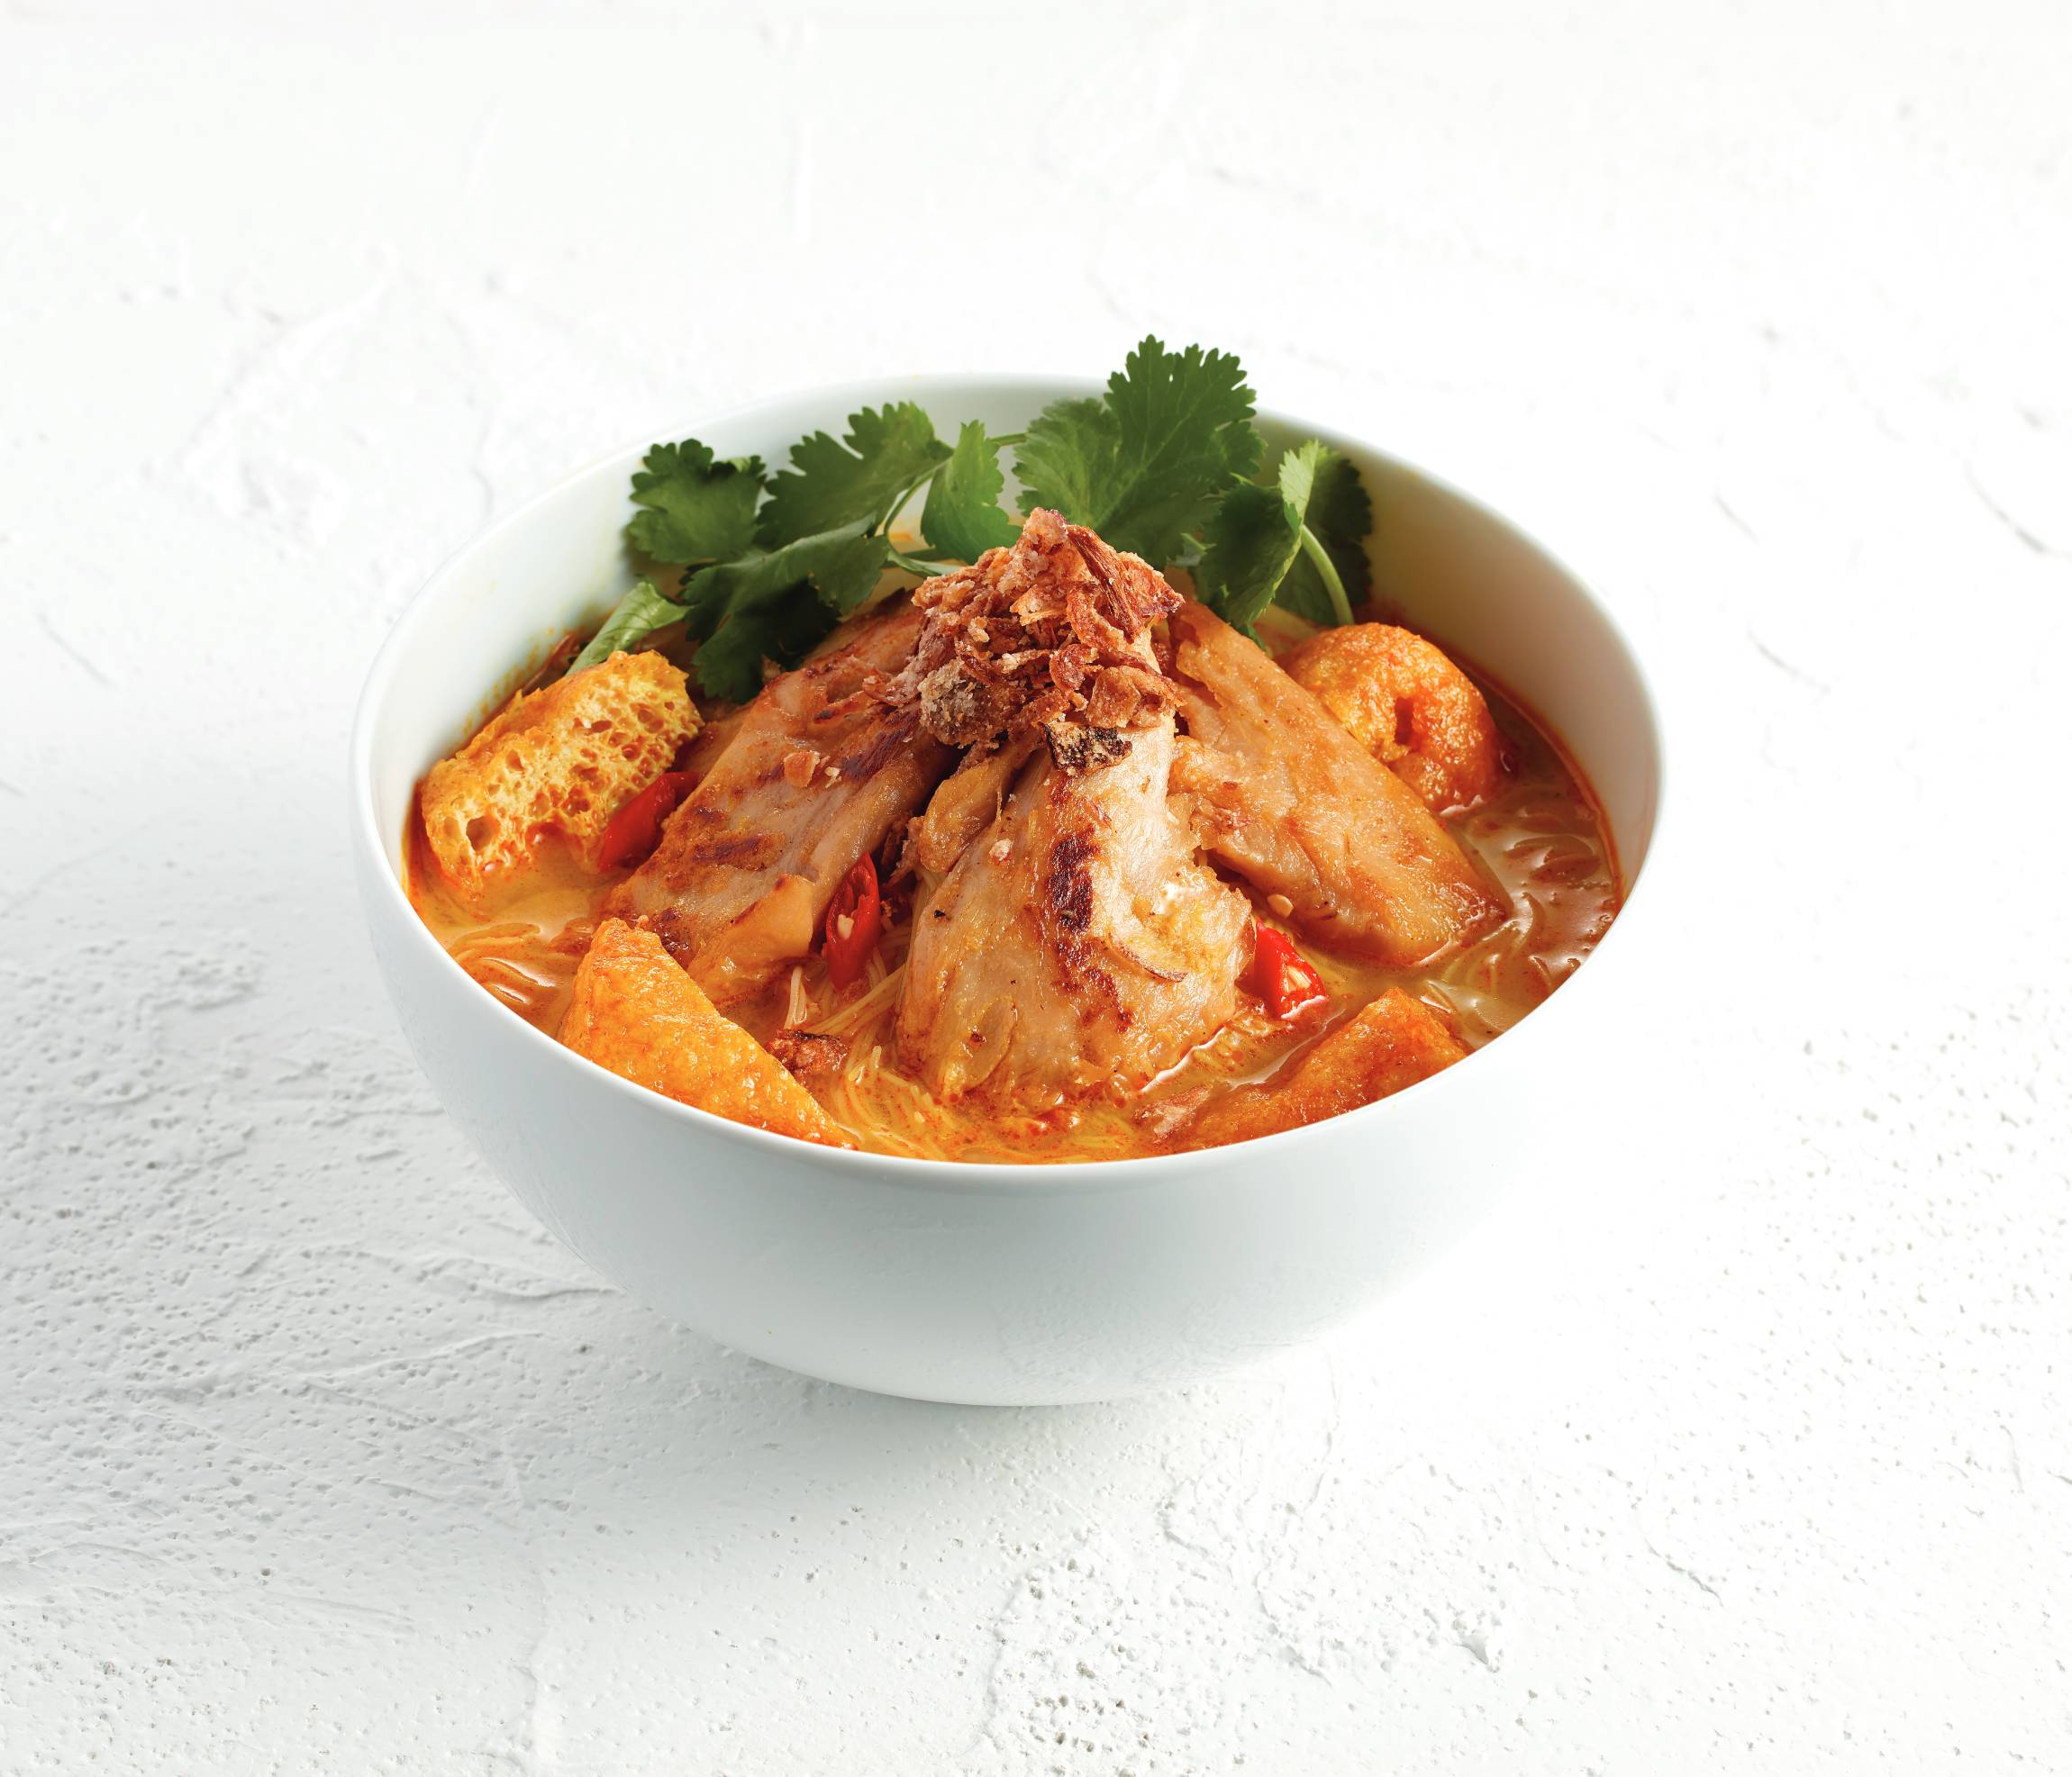 Laksa soup-flavored vermicelli